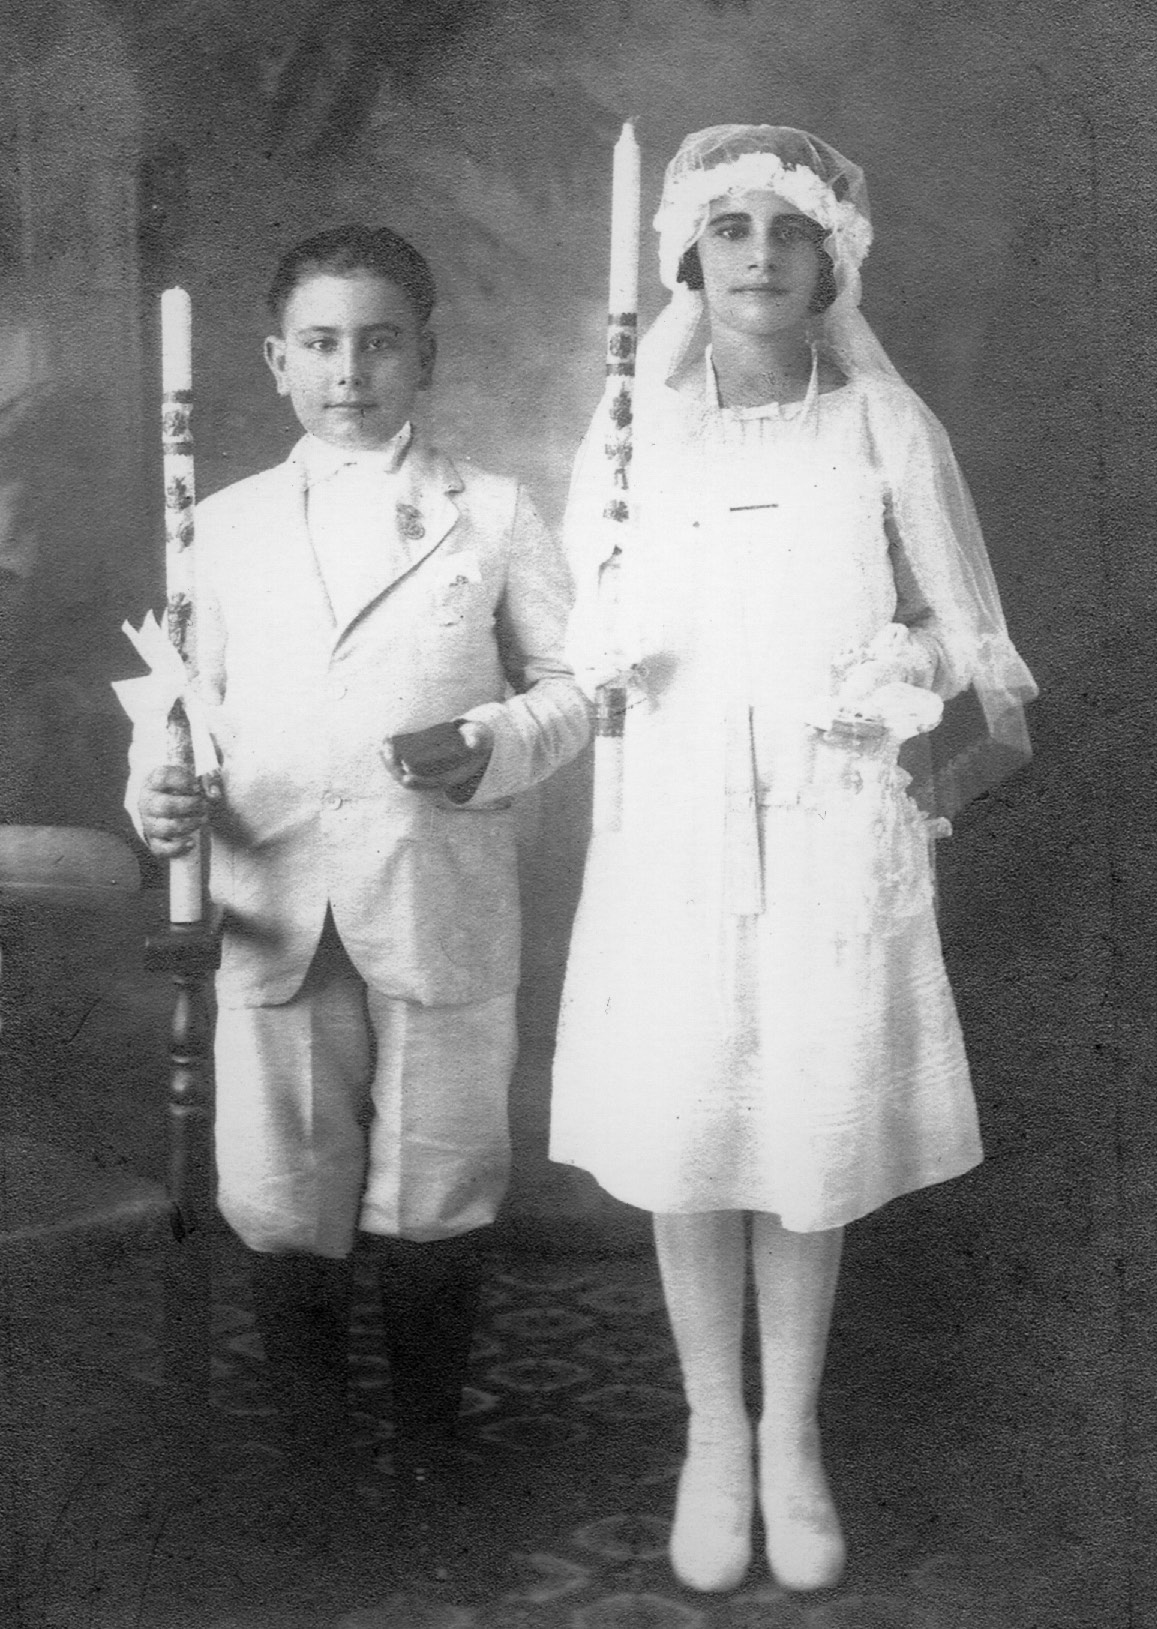 Josephine and Samuel Bosco